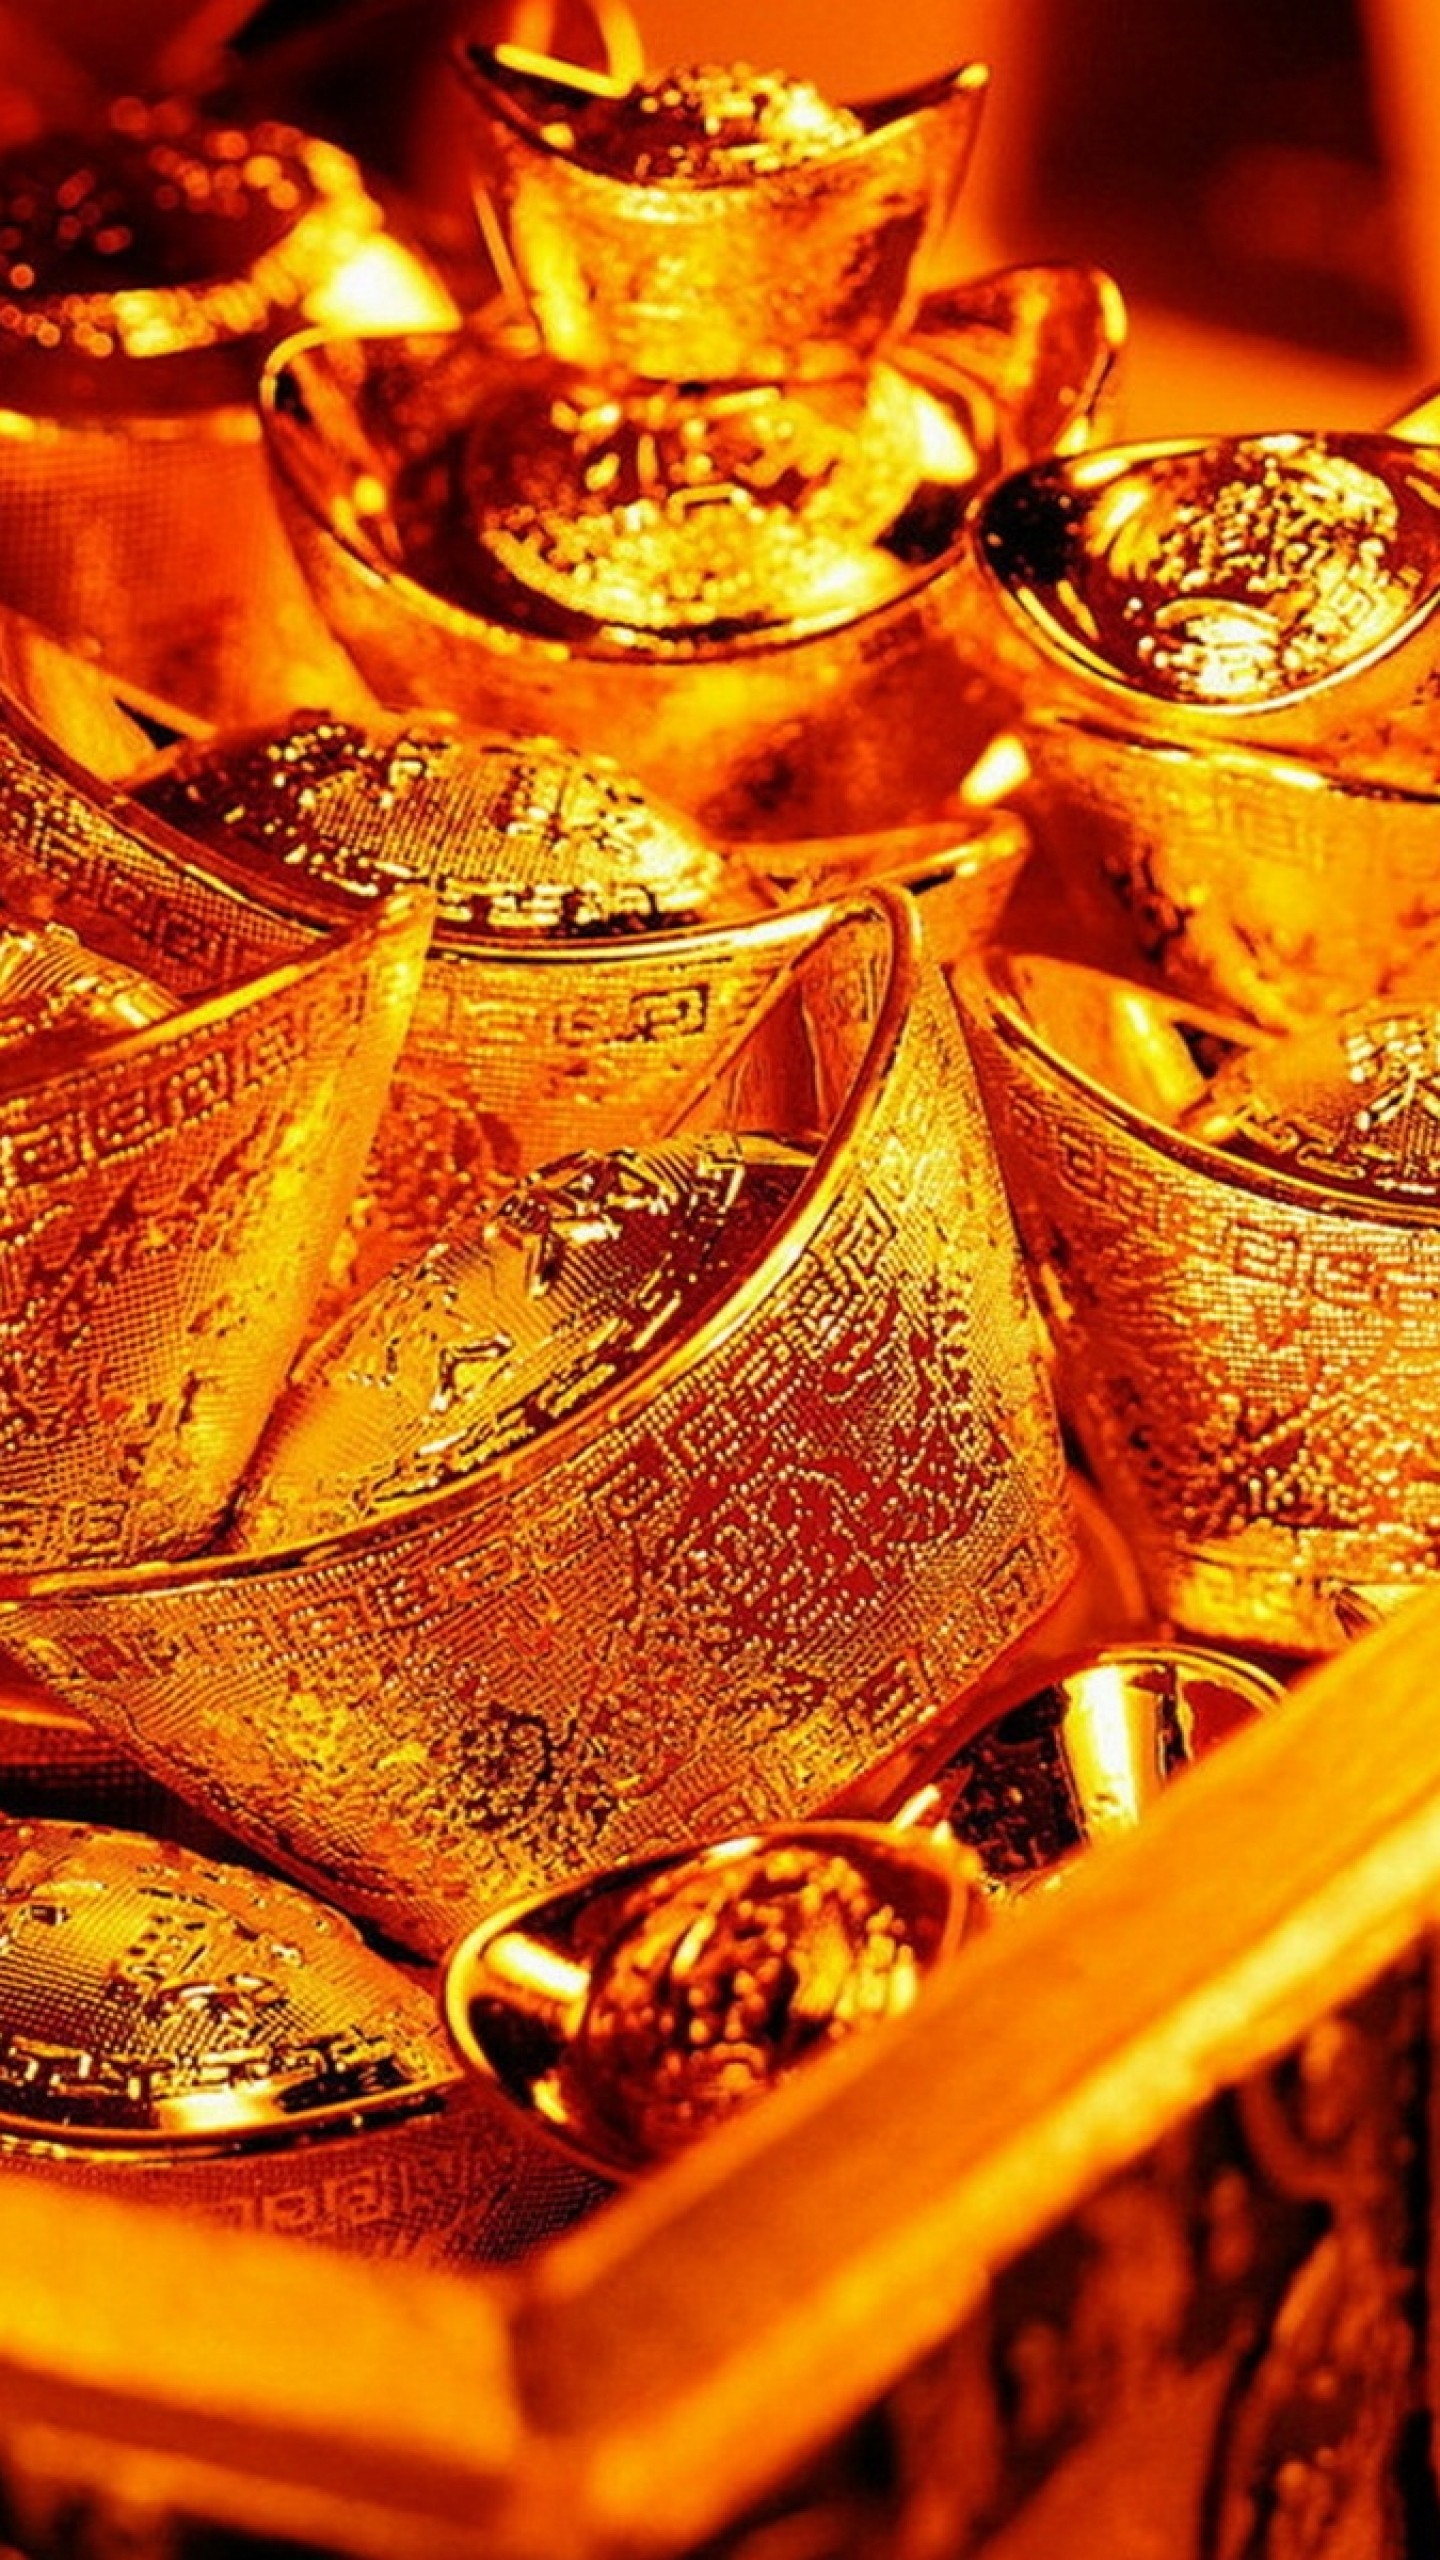 Preview wallpaper gold, chest, precious 1440×2560